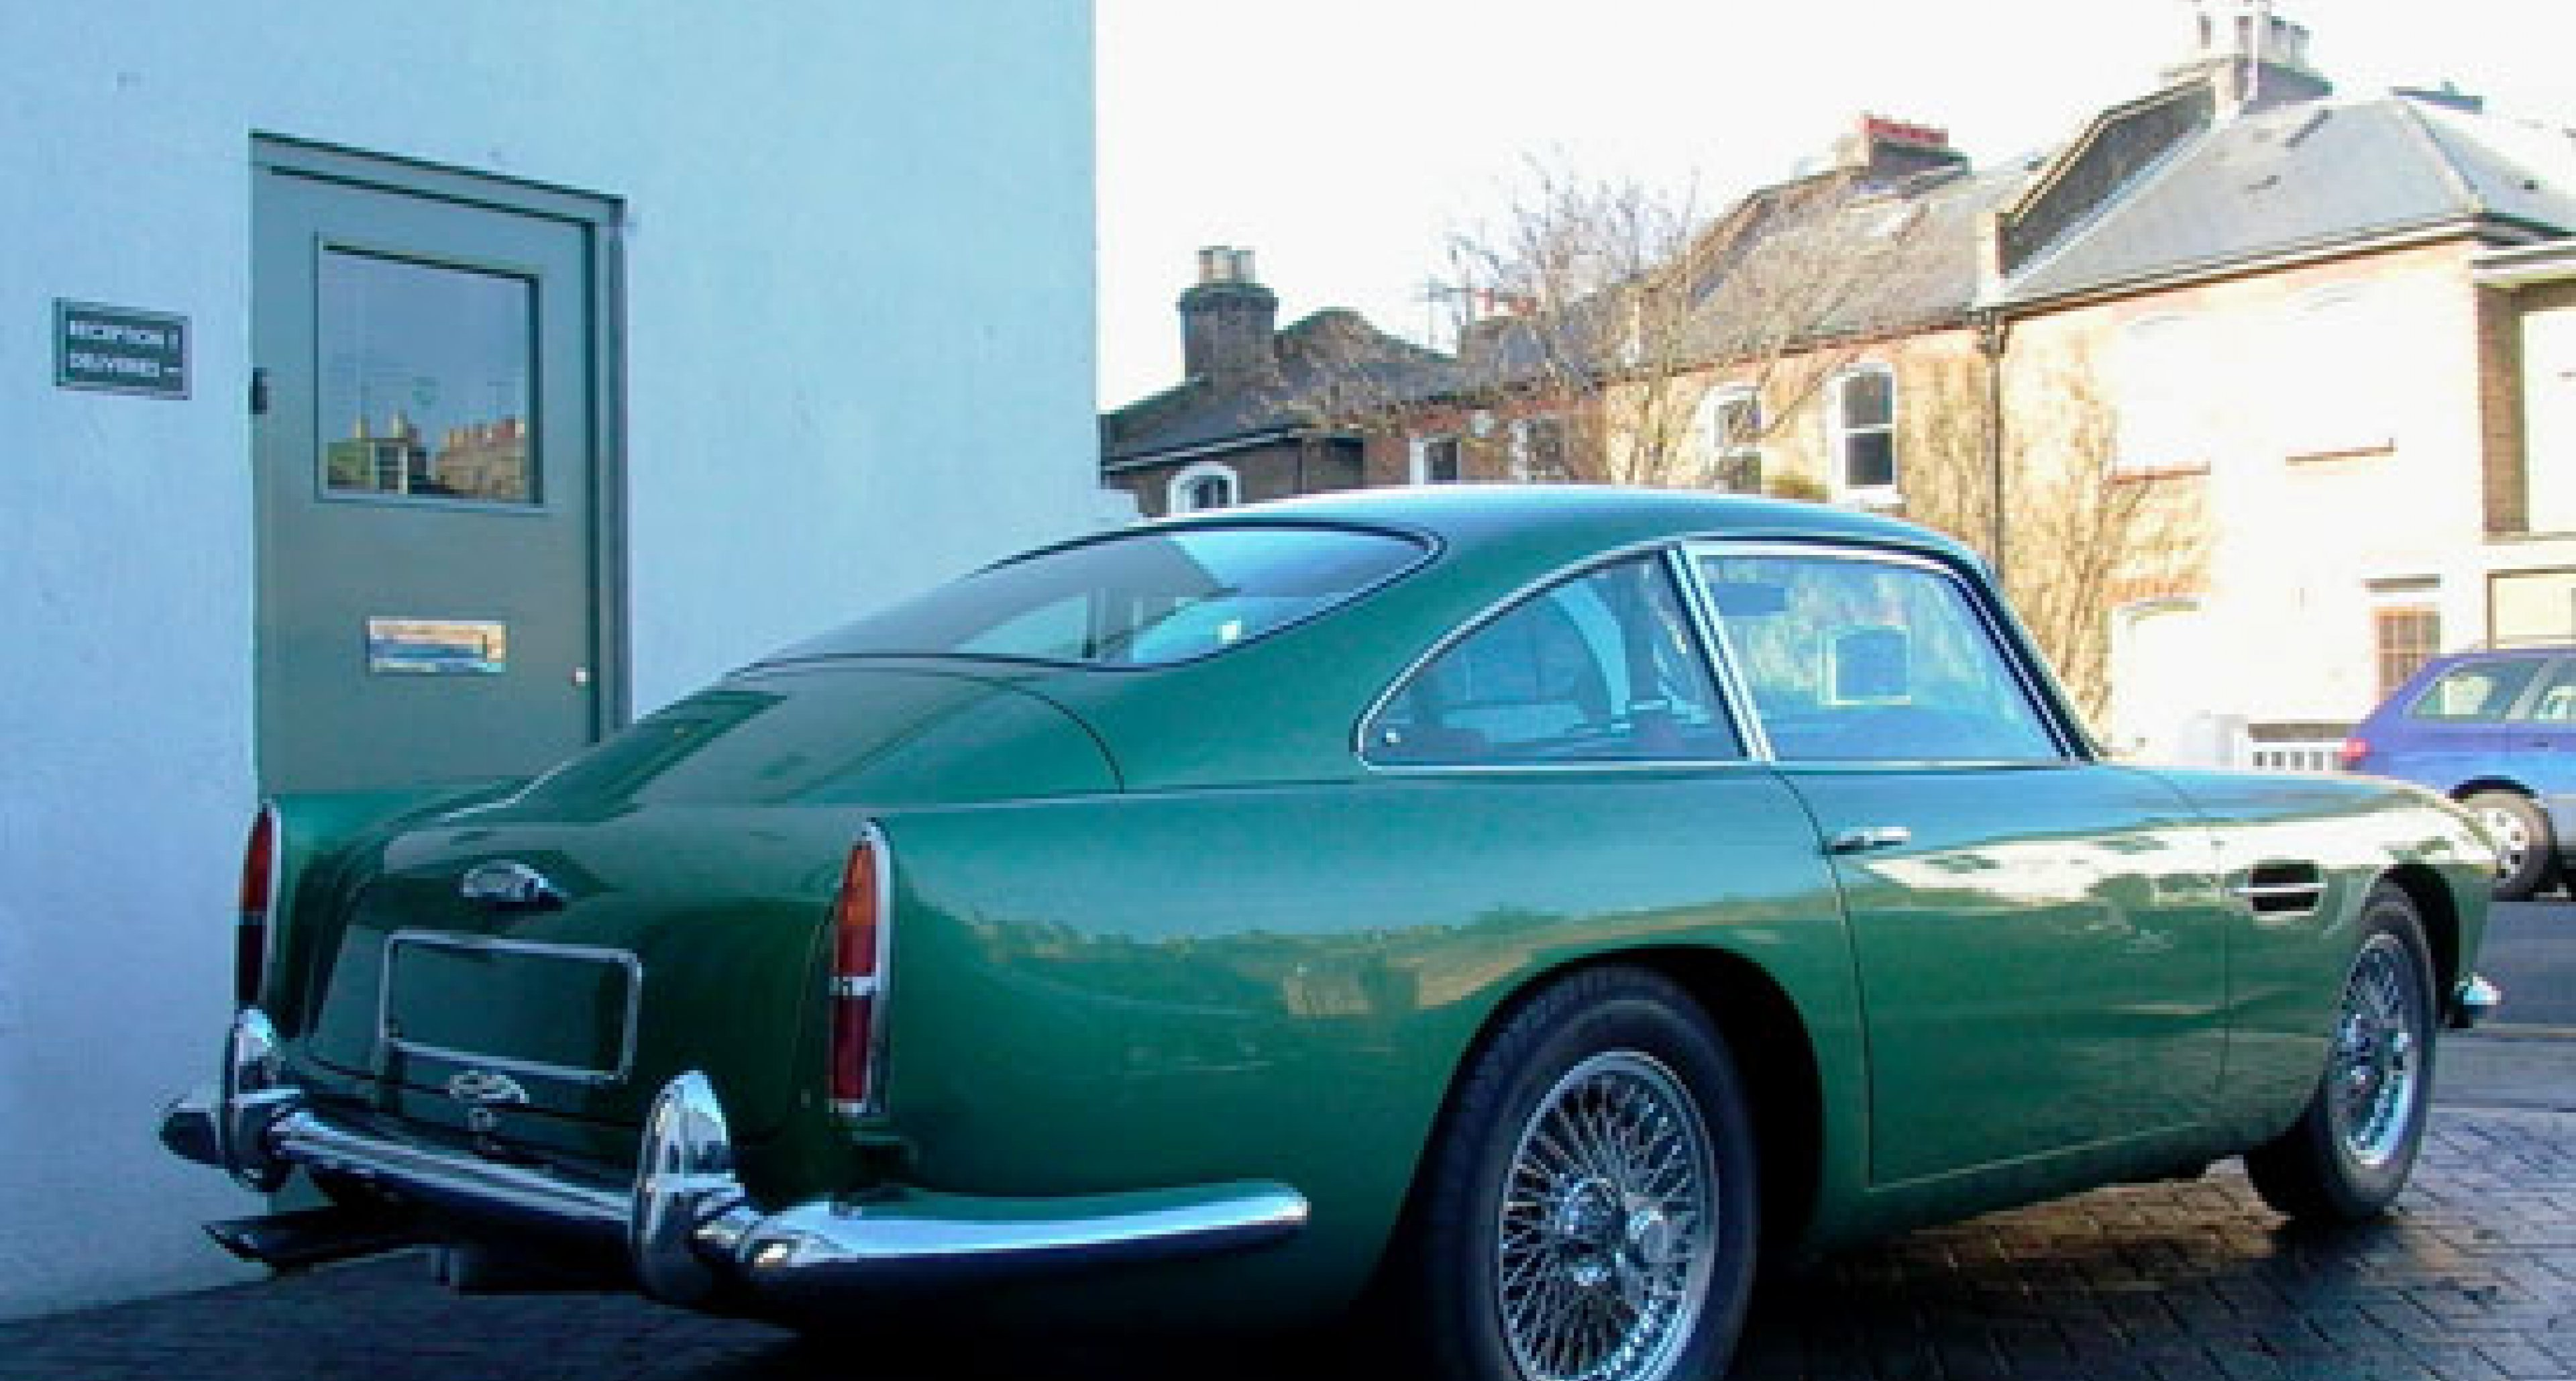 Aston Martin DB4 by Beacham